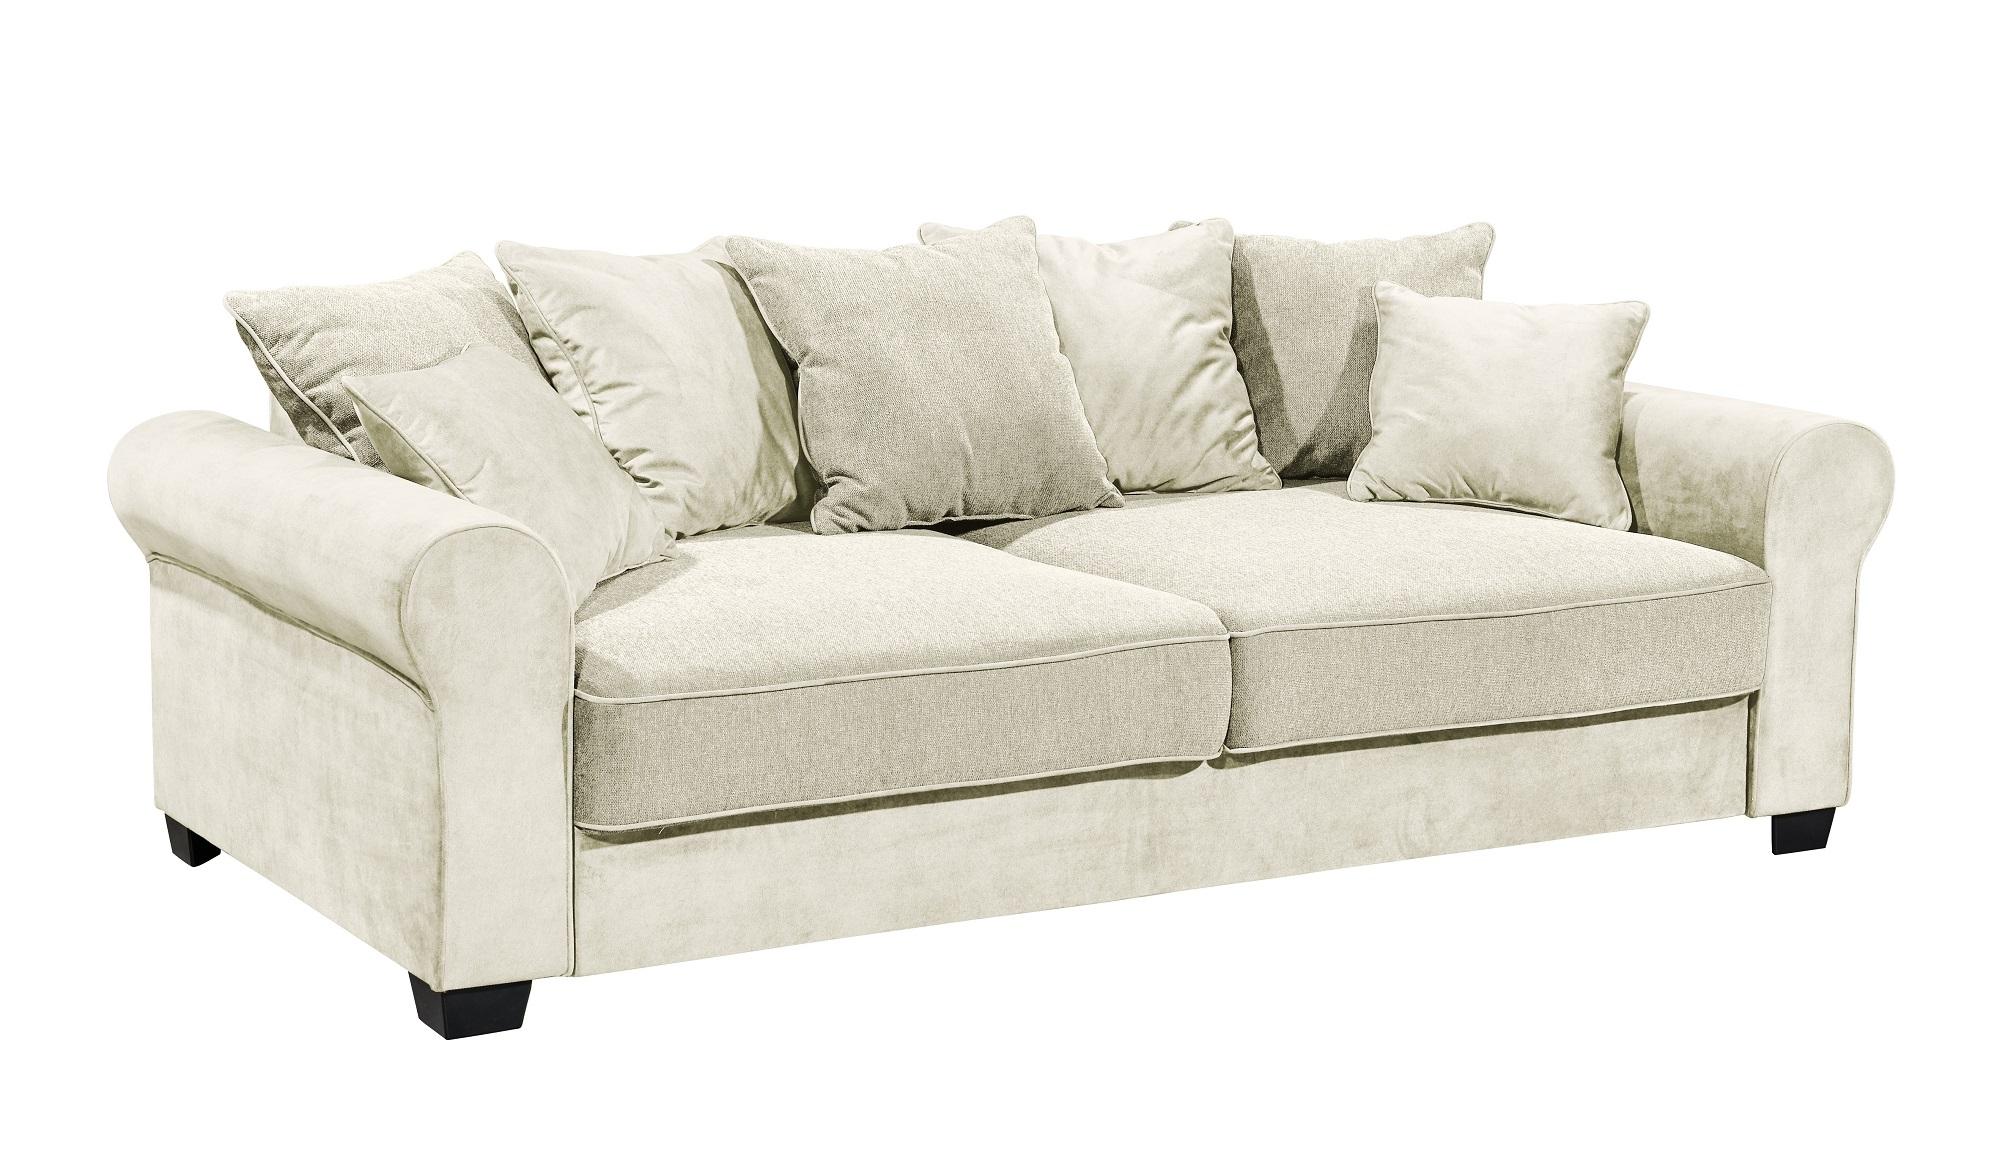 Canapea extensibila cu lada de depozitare, tapitata cu stofa, 3 locuri, Aurelis Crem, l247xA115xH95 cm poza